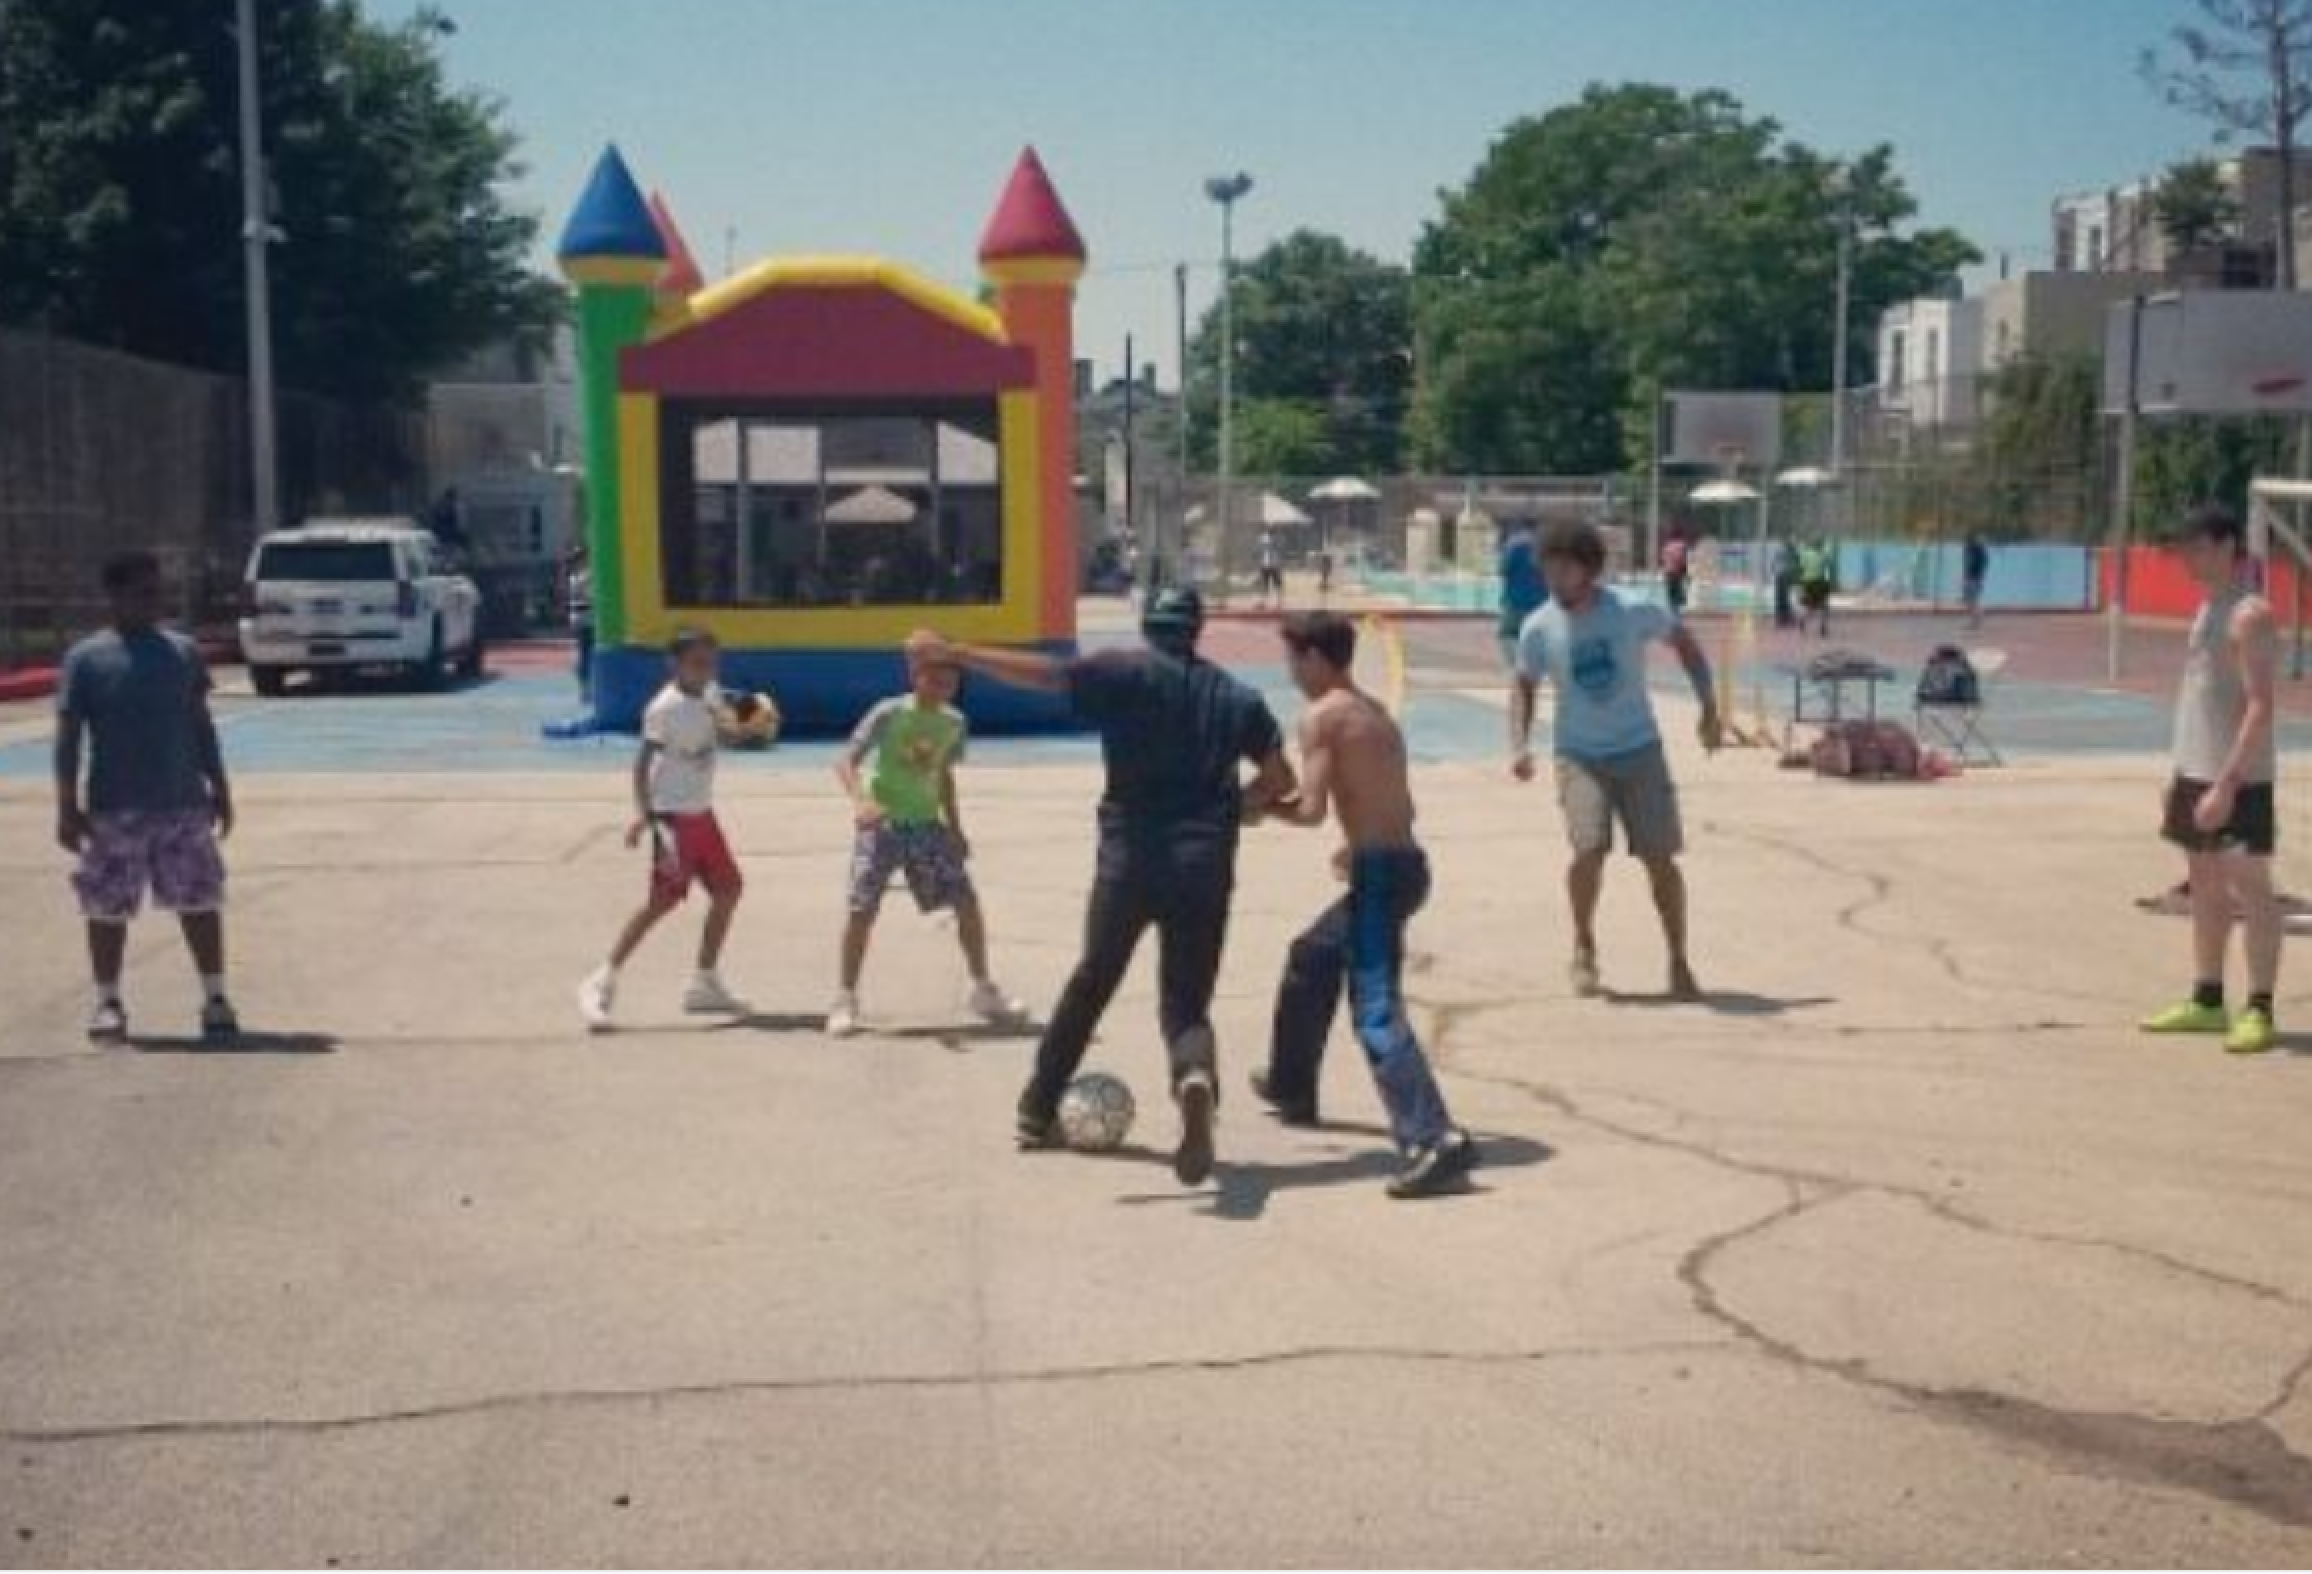 Waterloo Playground Community Festival